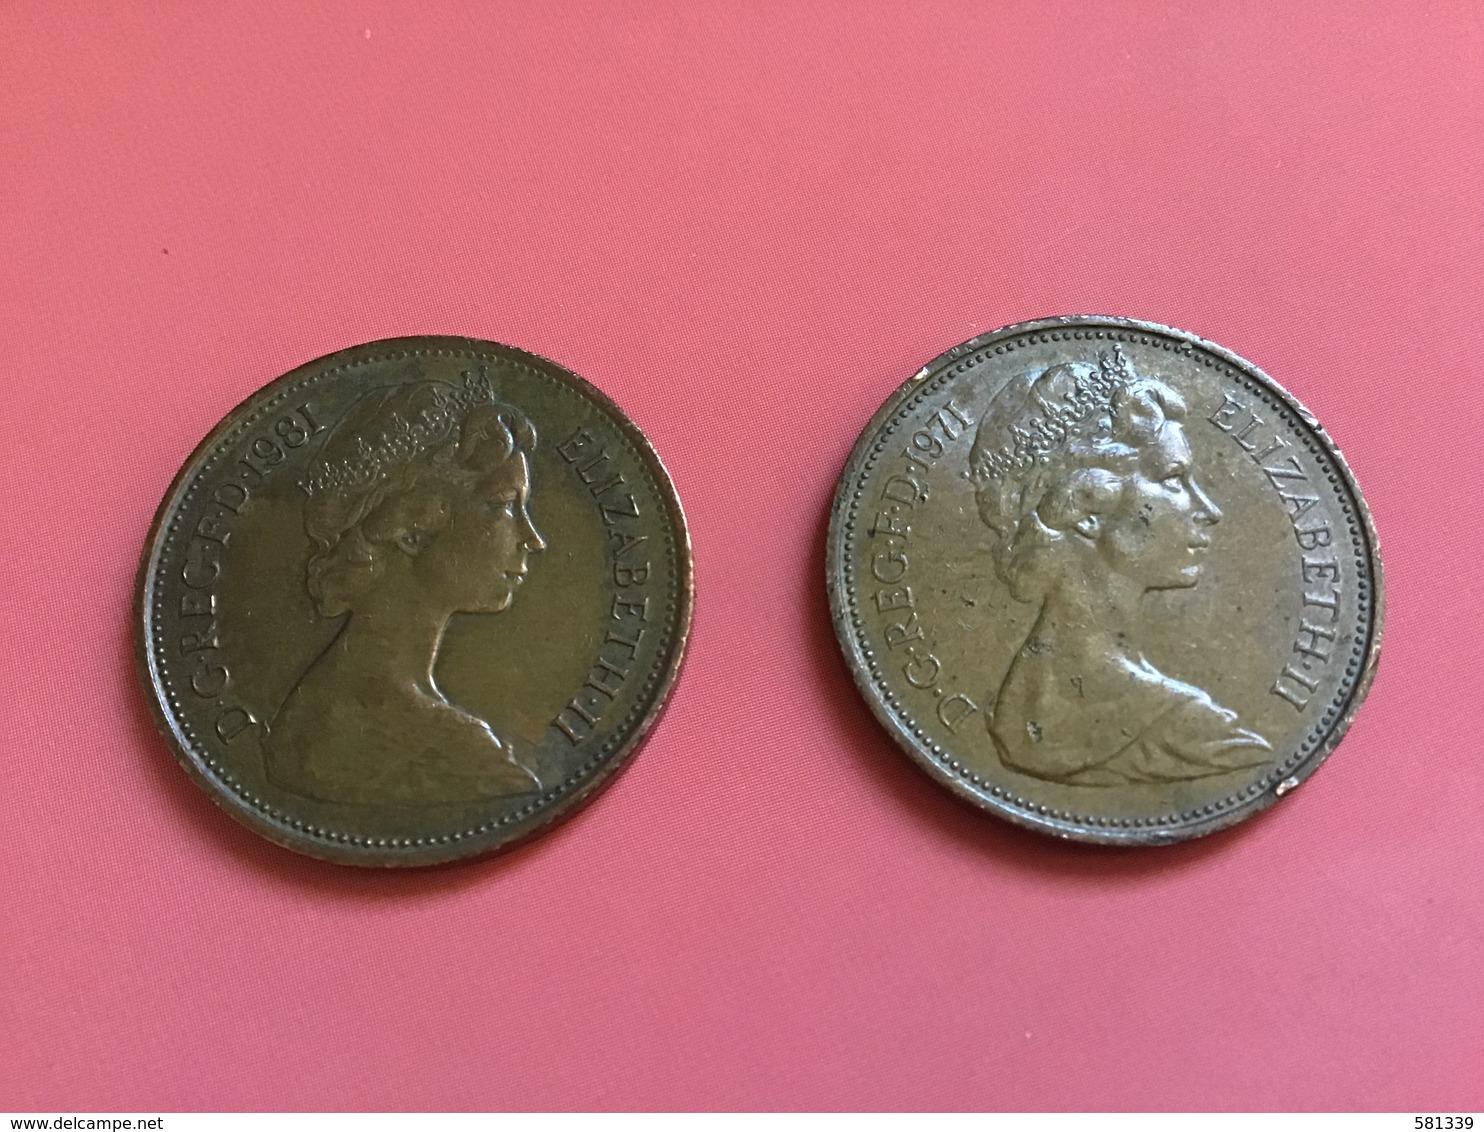 INGHILTERRA - ENGLAND  - 1971 - 1981 - 2 Monete Da  2 NEW PENCE - 2 Pence & 2 New Pence